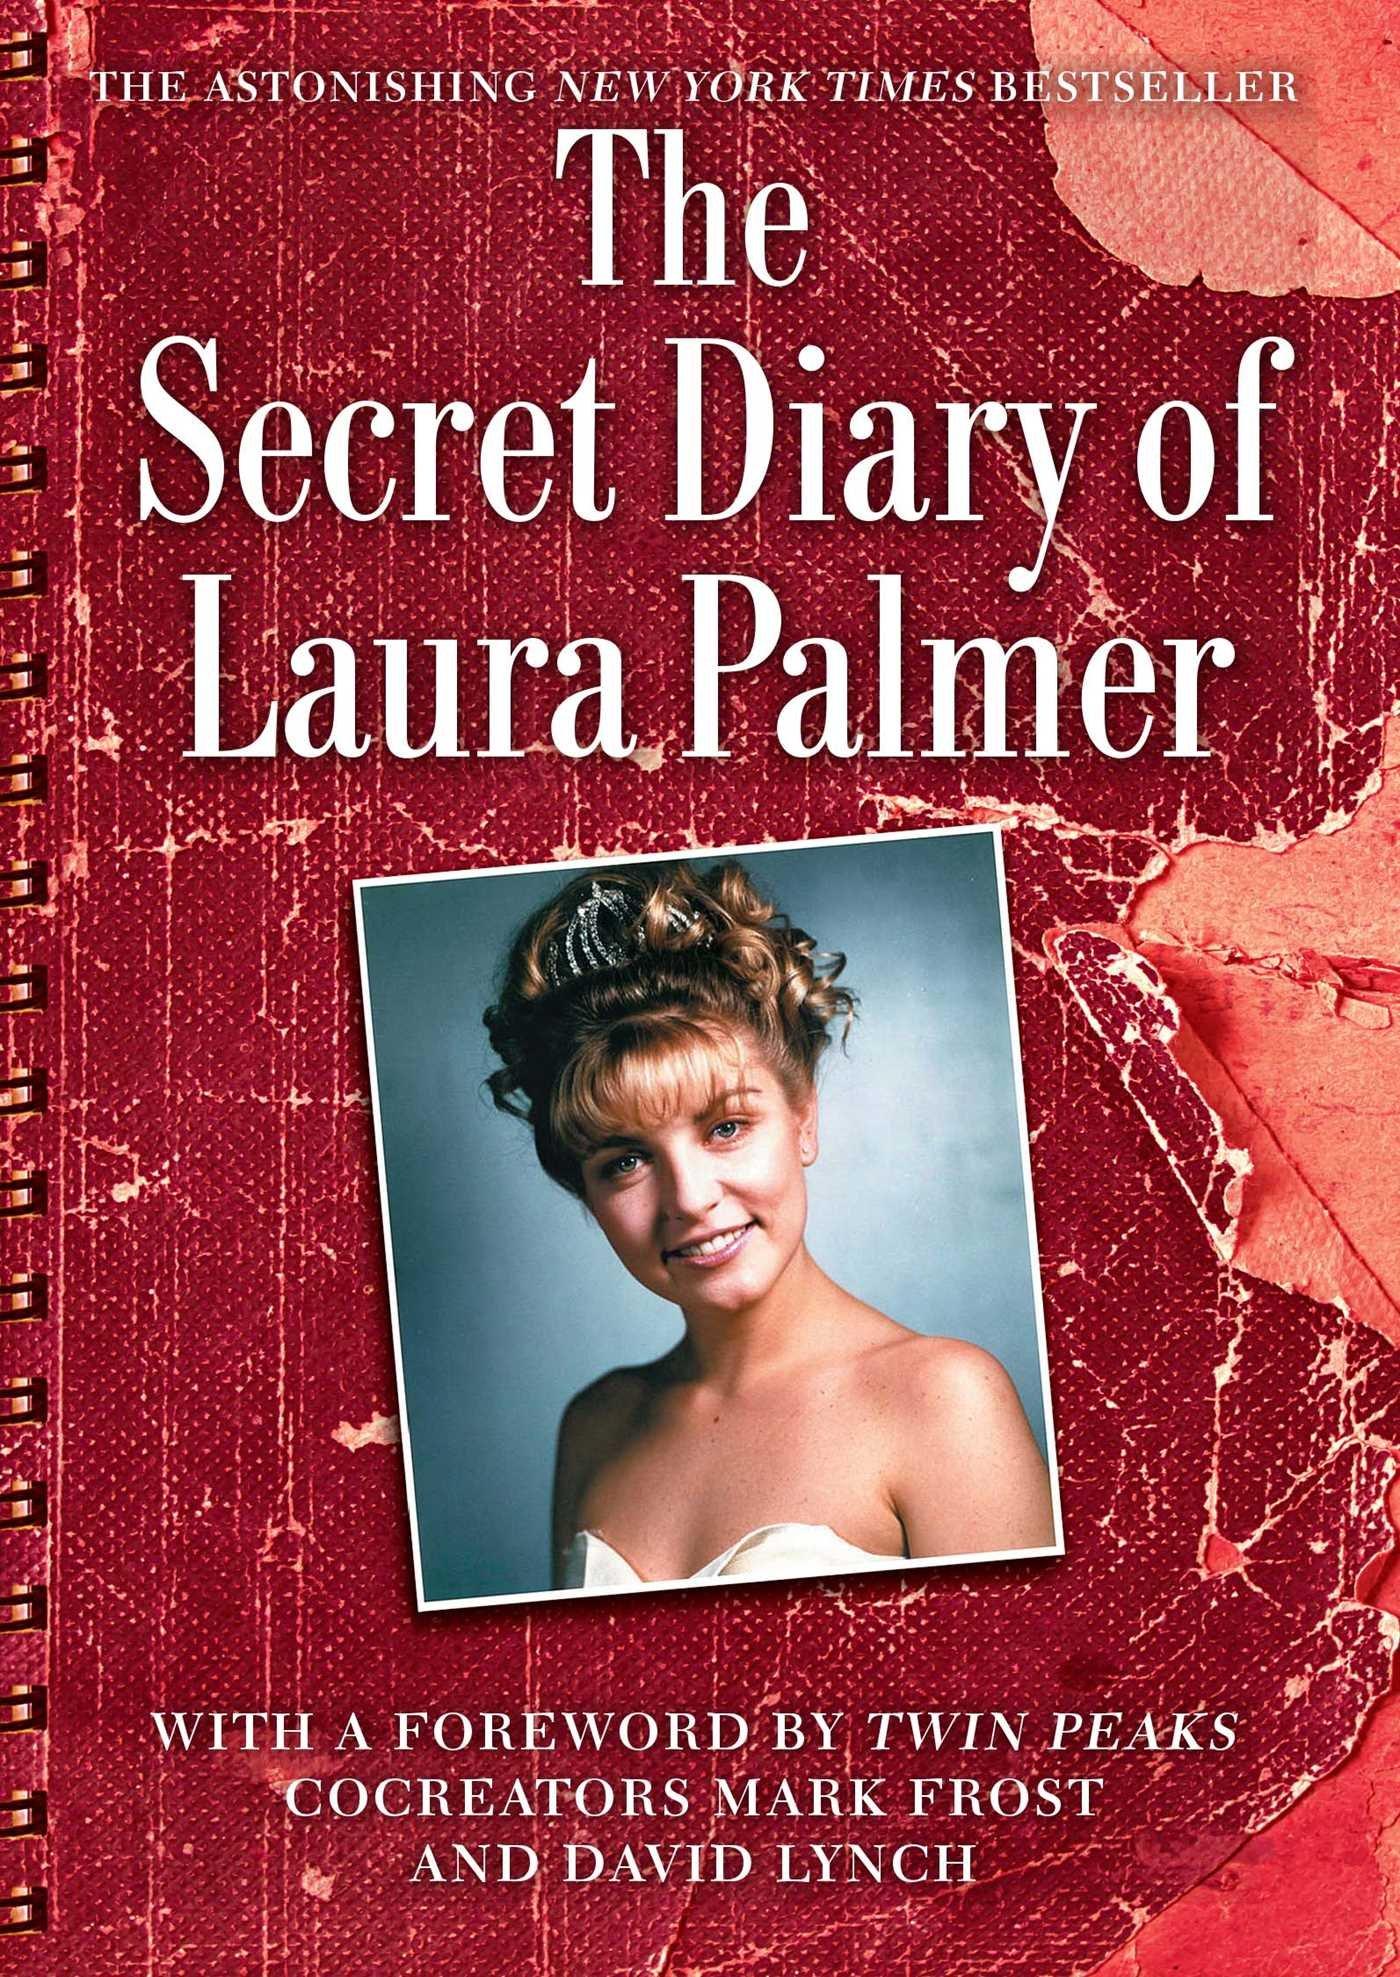 secret diary of laura palmer book